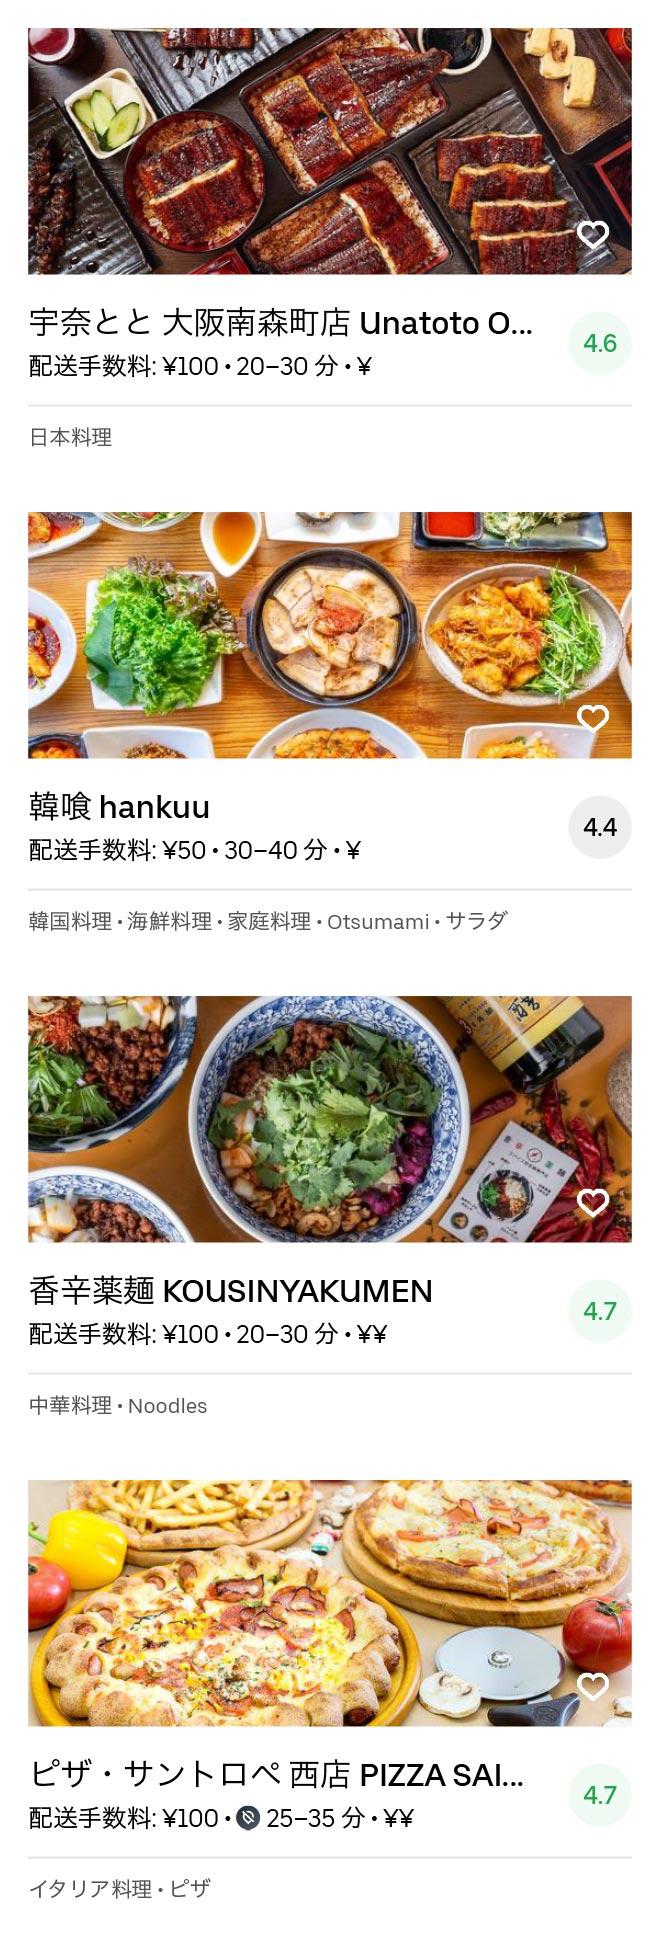 Osaka umeda menu 2005 11